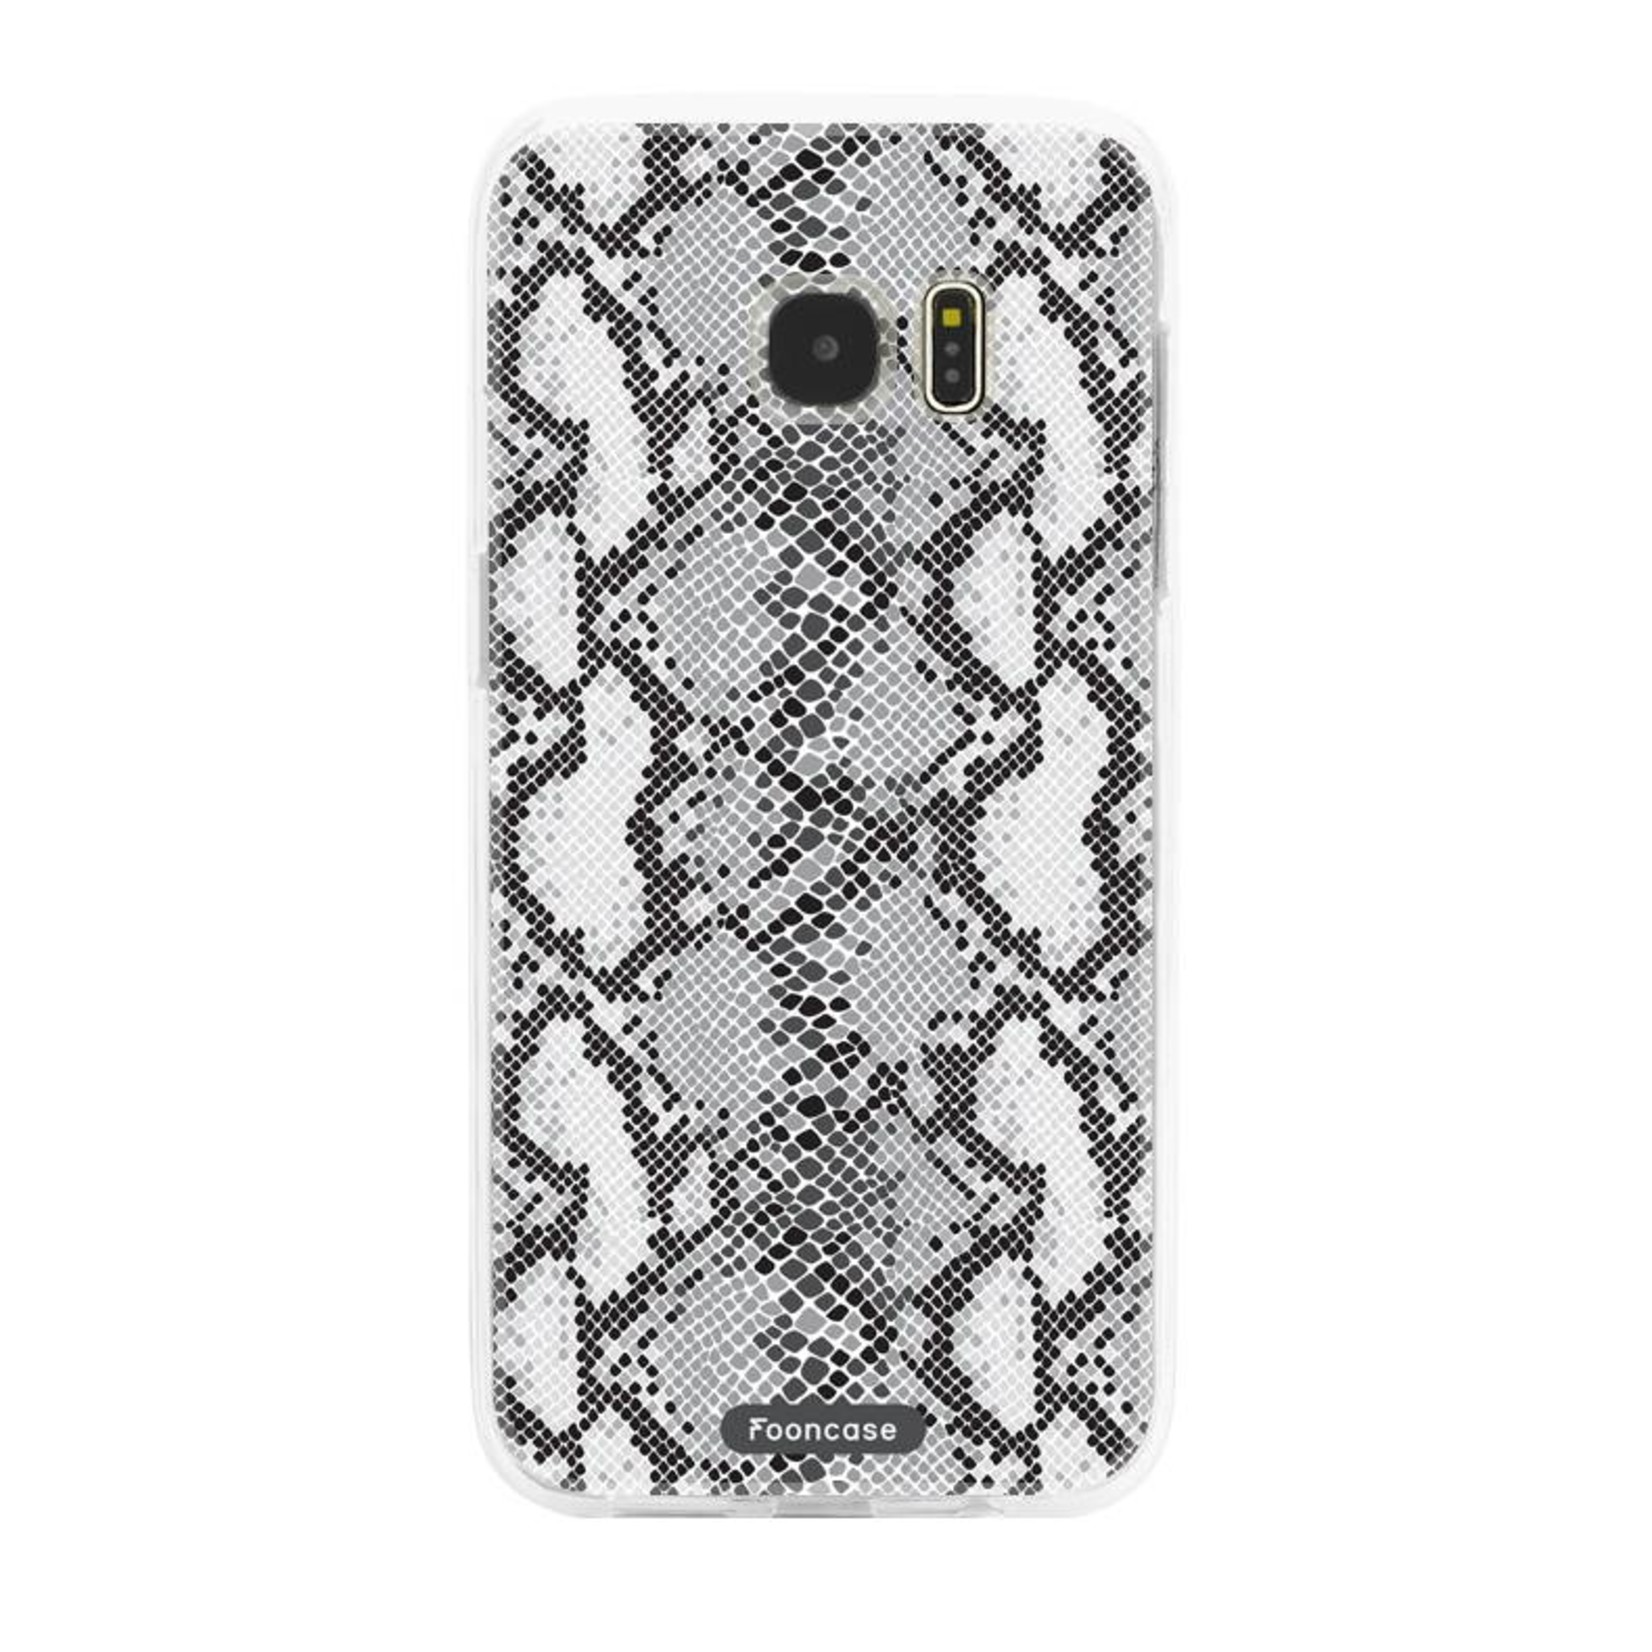 FOONCASE Samsung Galaxy S7 Edge hoesje TPU Soft Case - Back Cover - Snake it / Slangen print